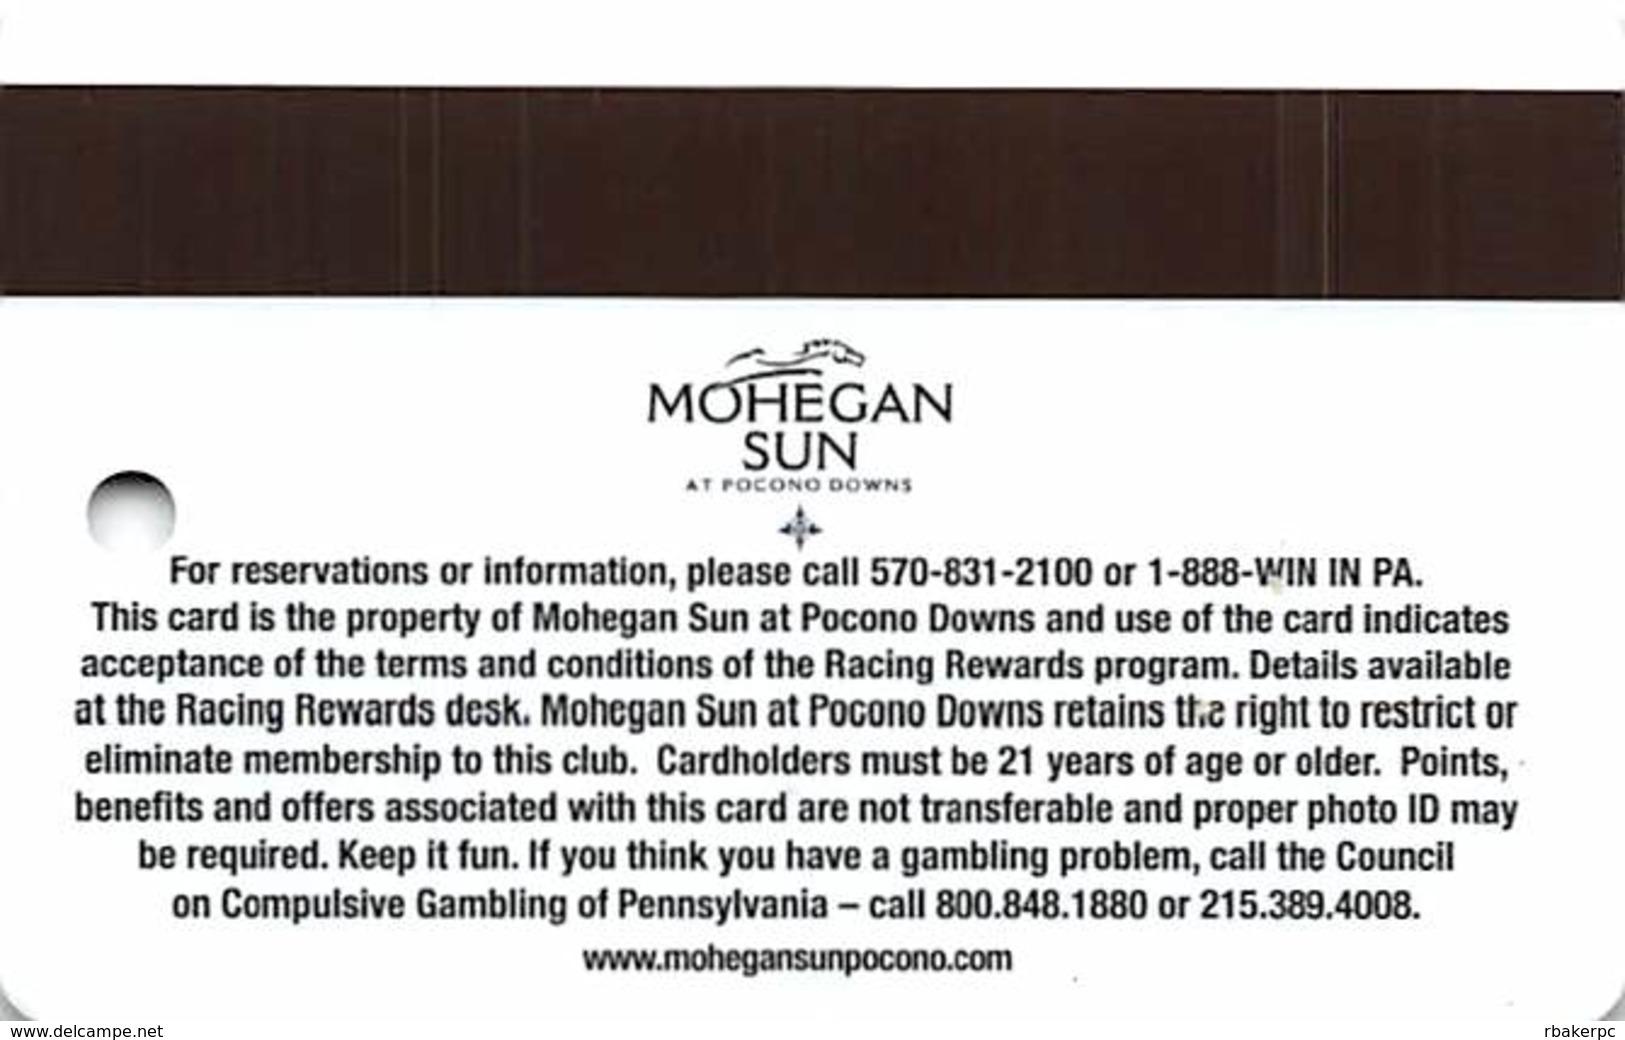 Mohegan Sun Casino At Pocono Downs - Wilks-Barre, PA USA - Racing Rewards Slot Card - Casino Cards